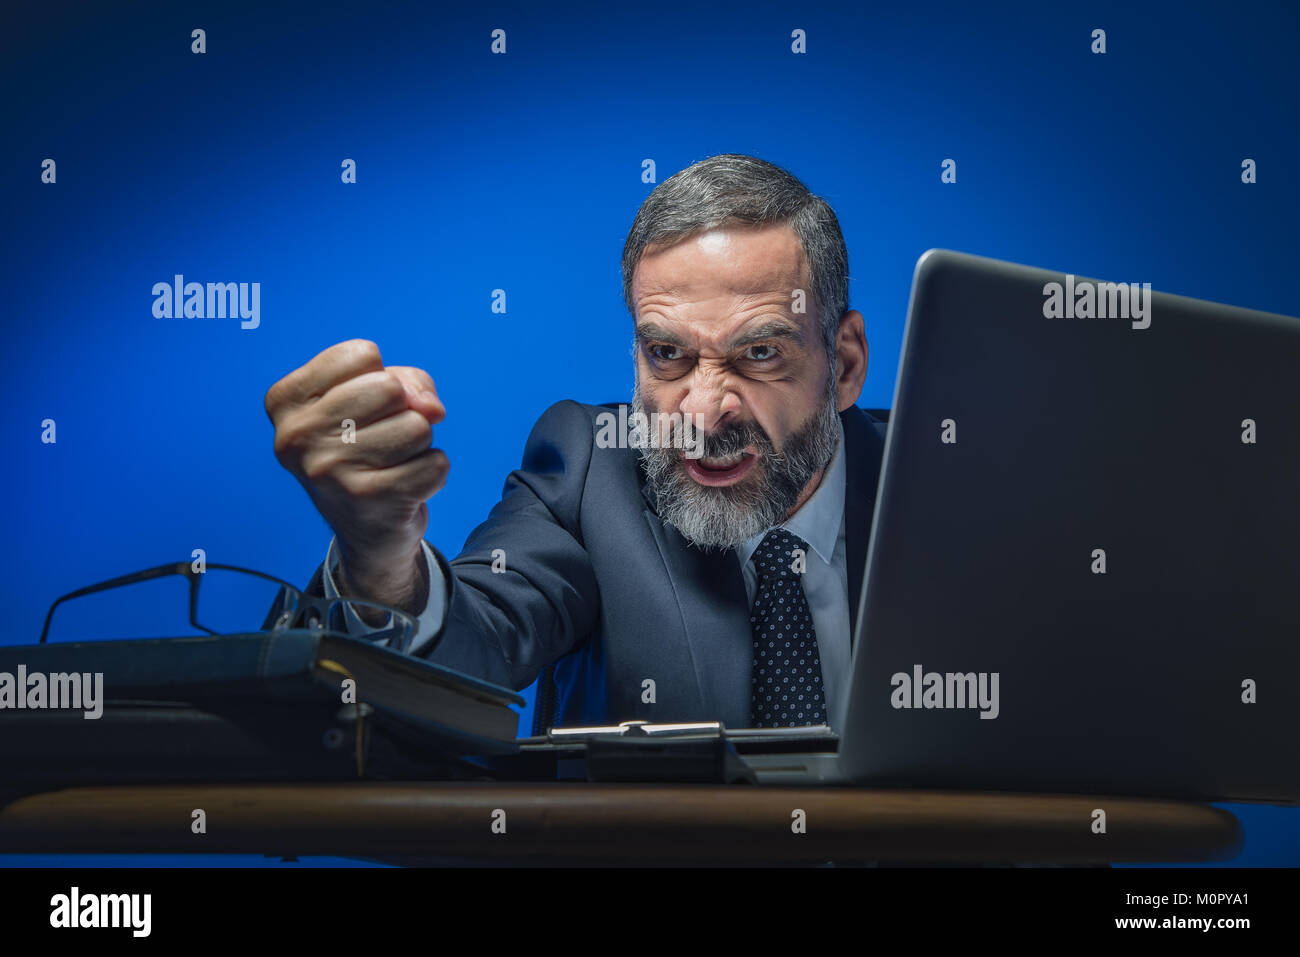 Mad, infeliz boss amenazando Imagen De Stock